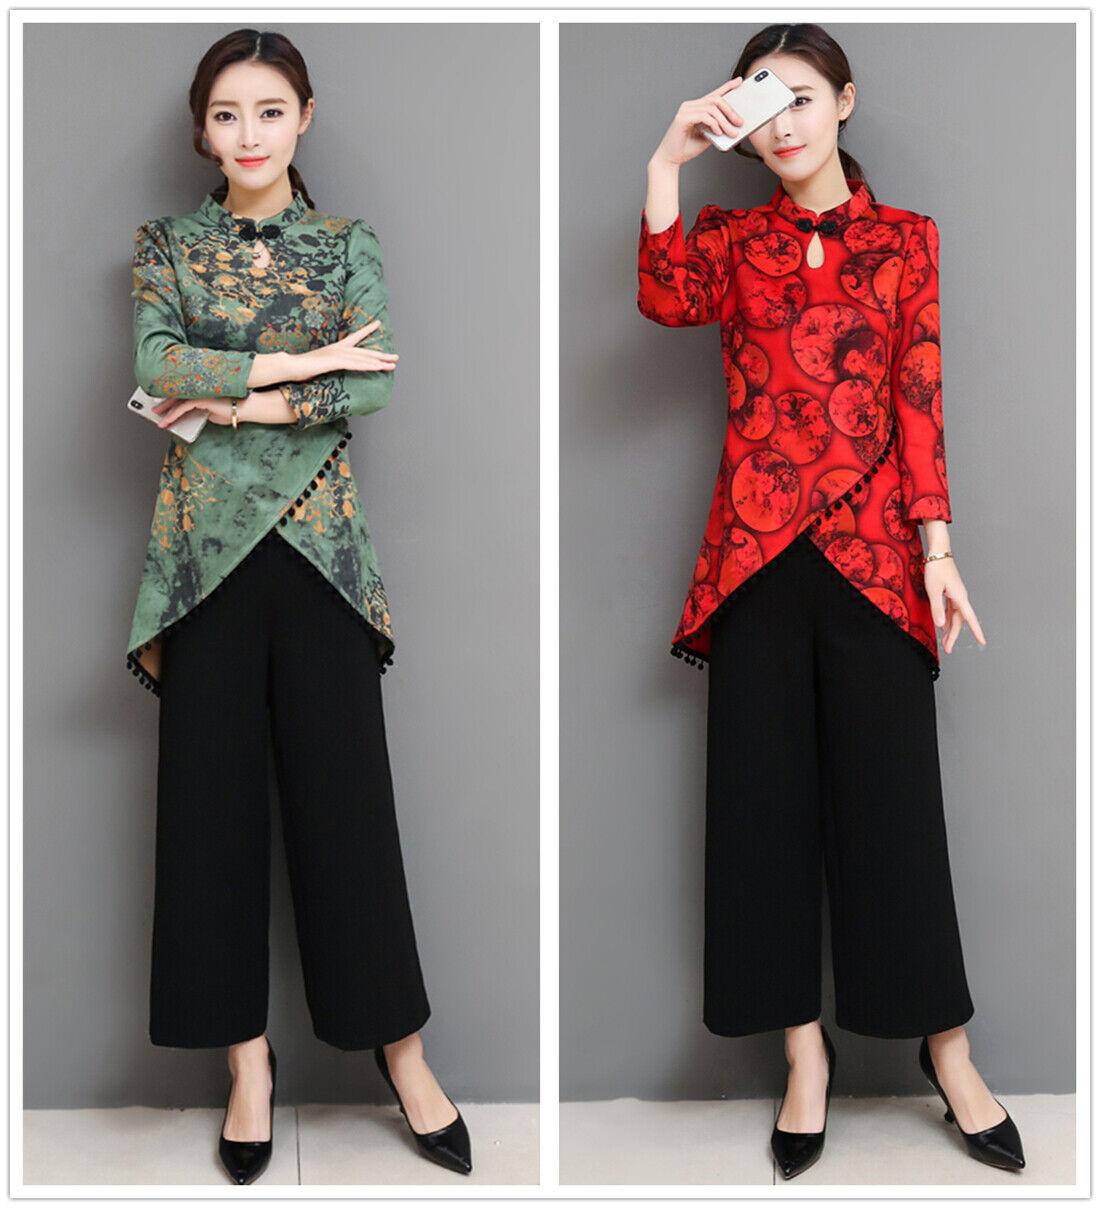 New Spring Long Sleeves Women's Long Slim Shirt Blouses & Loose Pants Set M-4XL